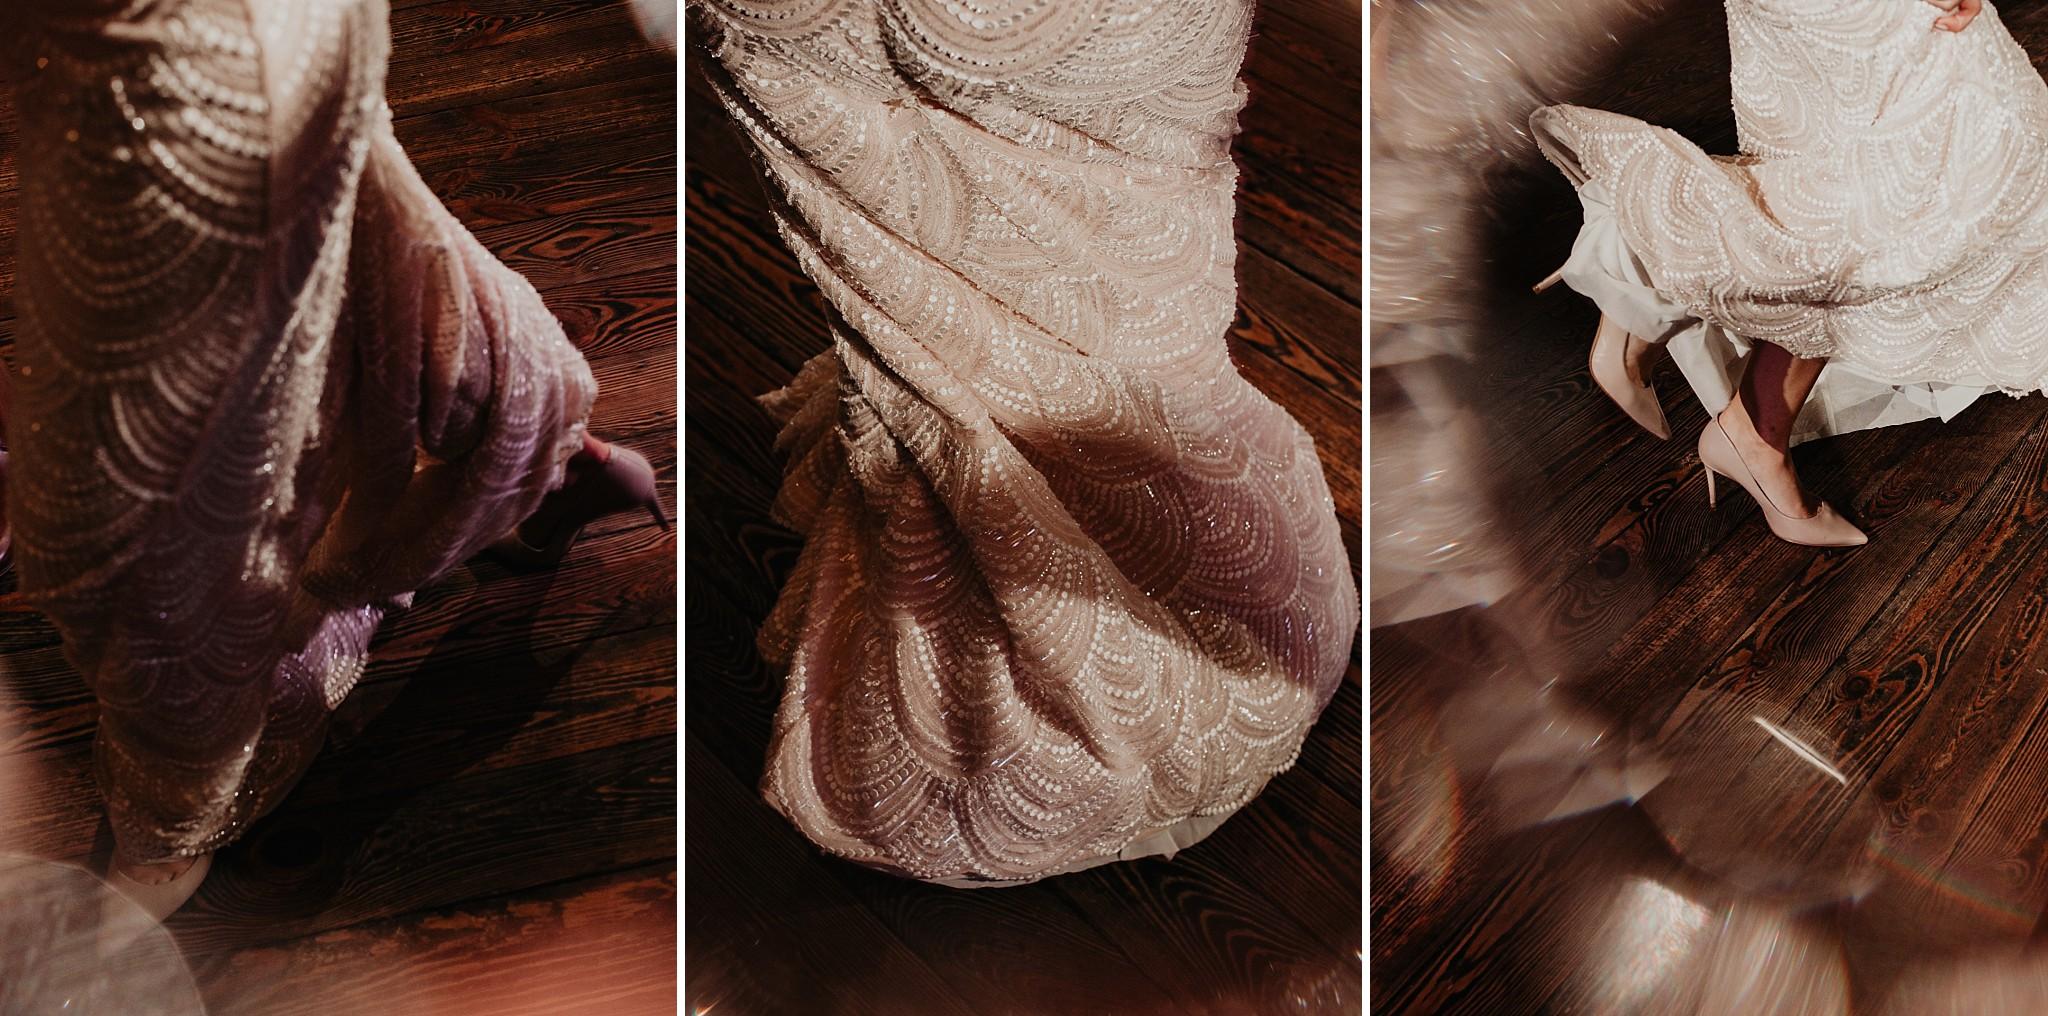 fotograf poznan wesele dobra truskawka piekne wesele pod poznaniem wesele w dobrej truskawce piekna para mloda slub marzen slub koronawirus slub listopad wesele koronawirus 392